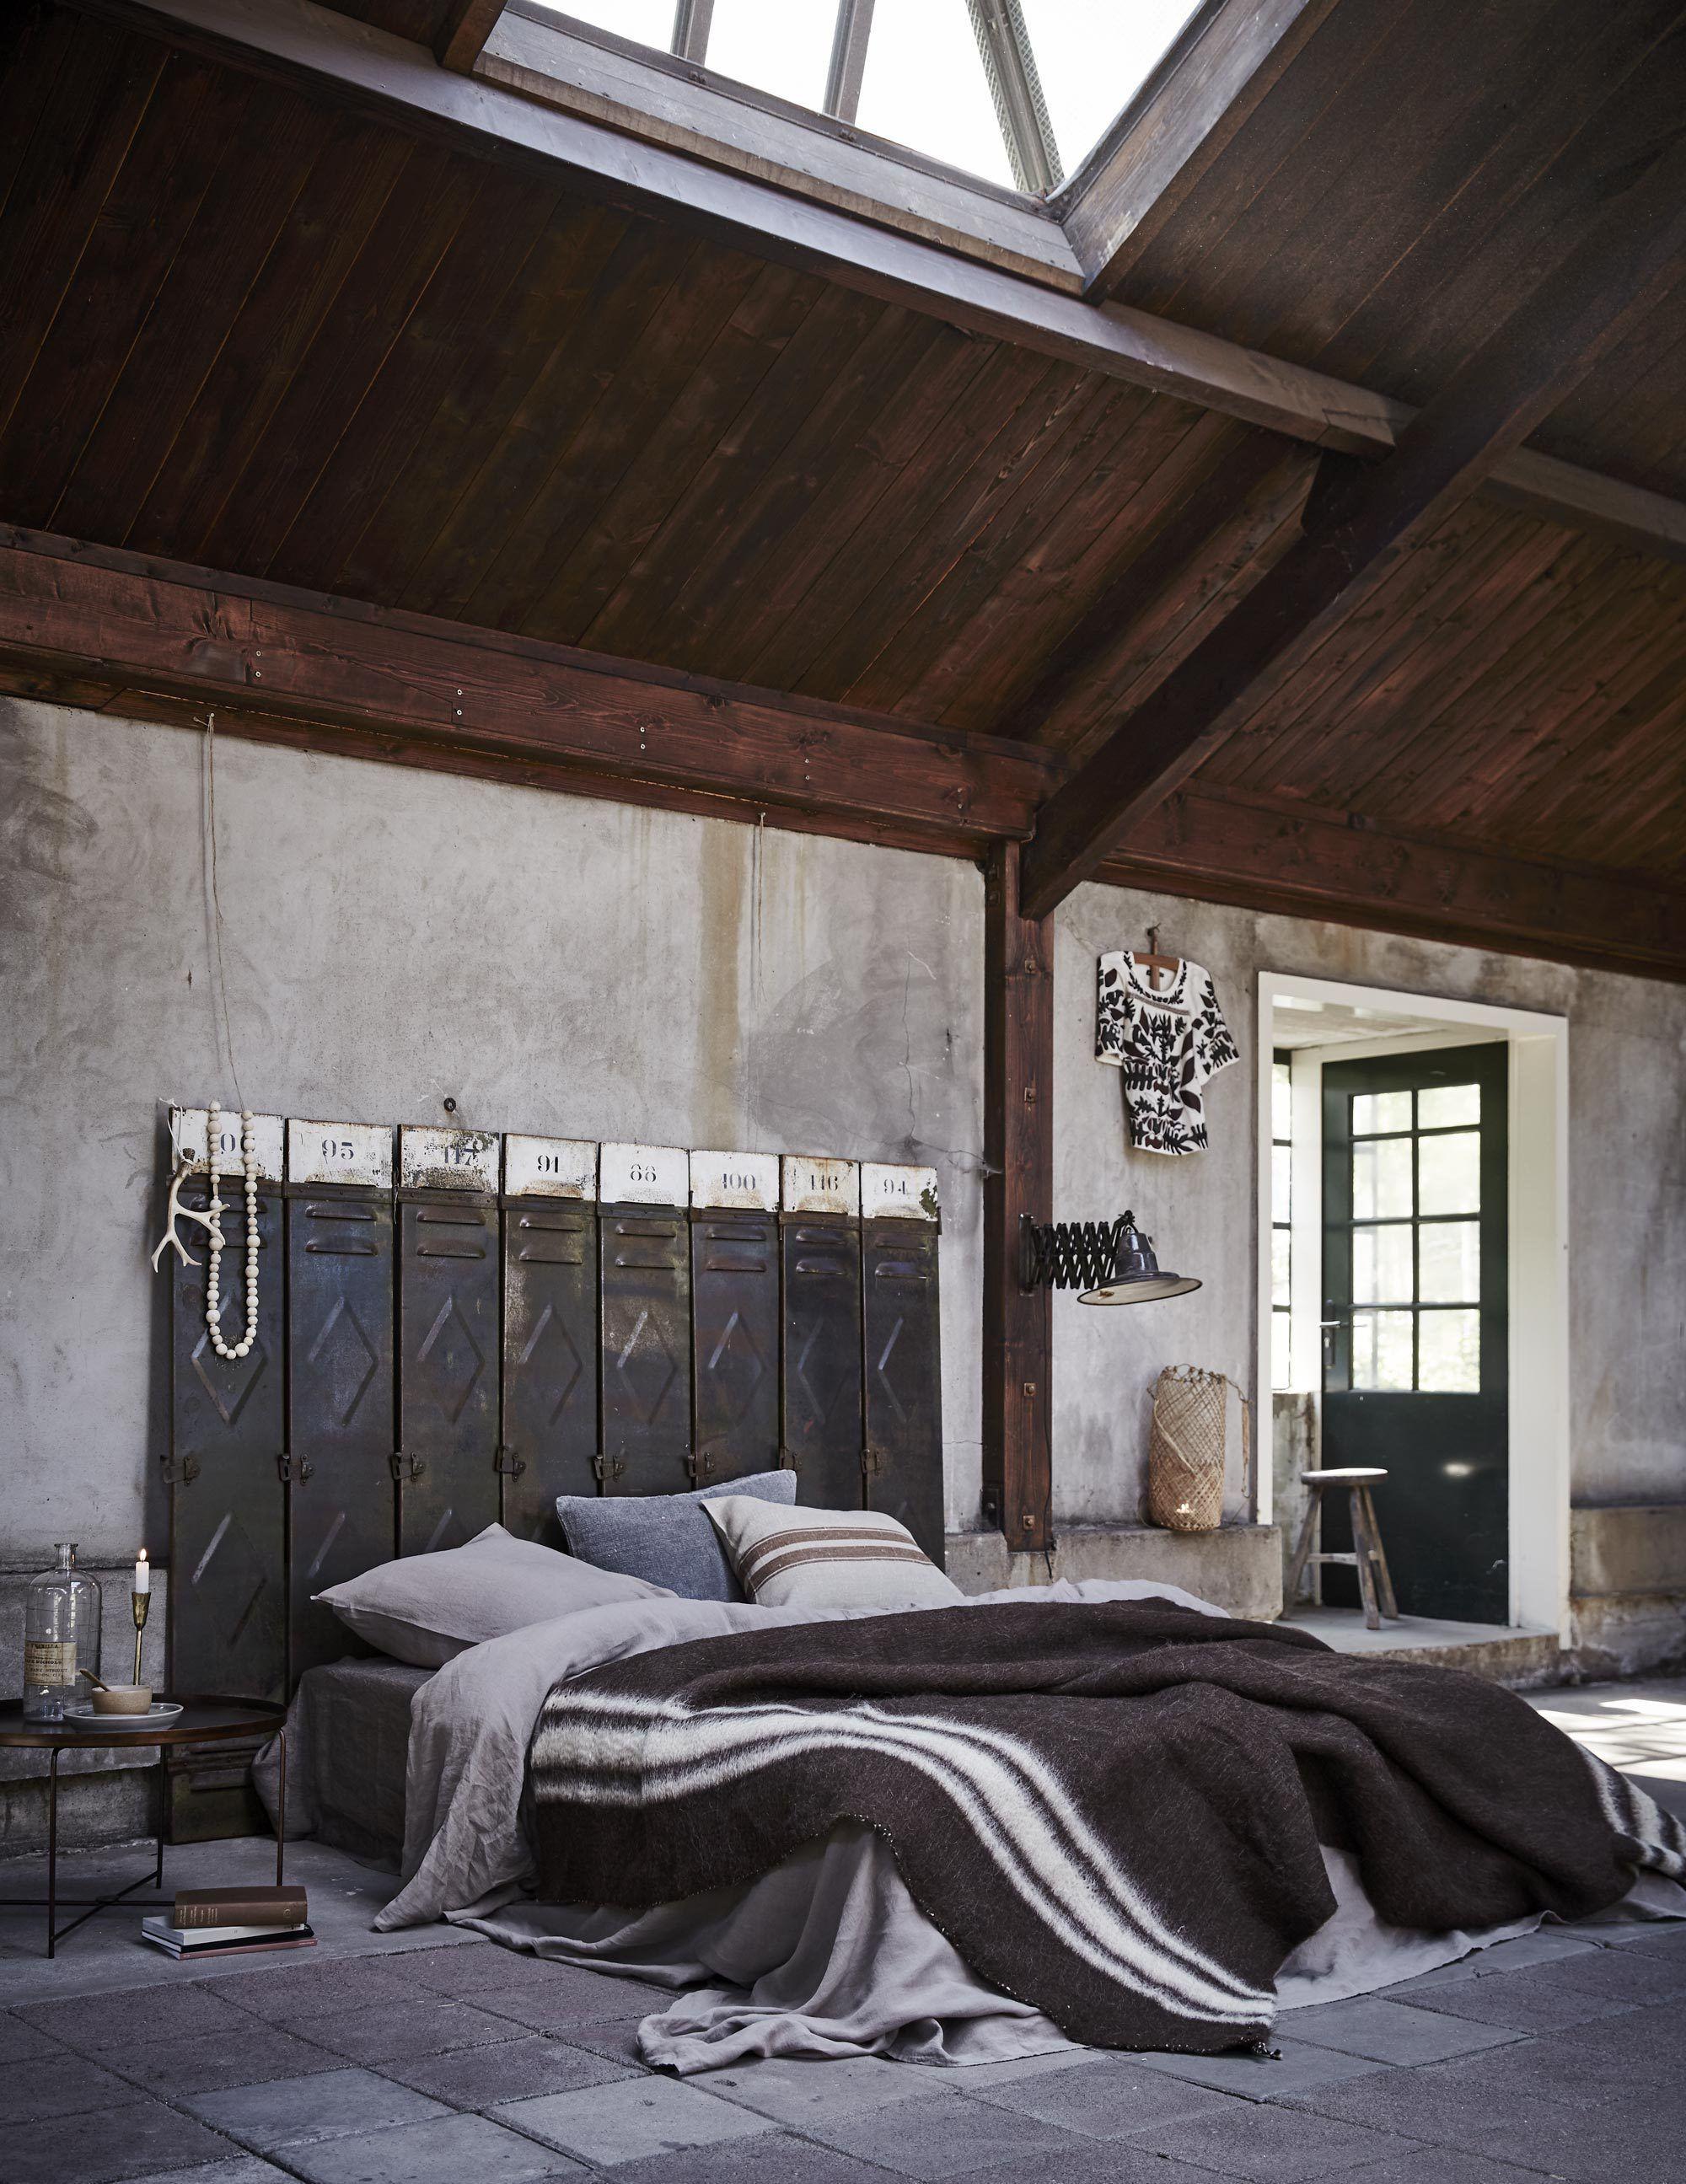 bedspace | Heminredning | Pinterest | Chambres, Chambre femme et ...